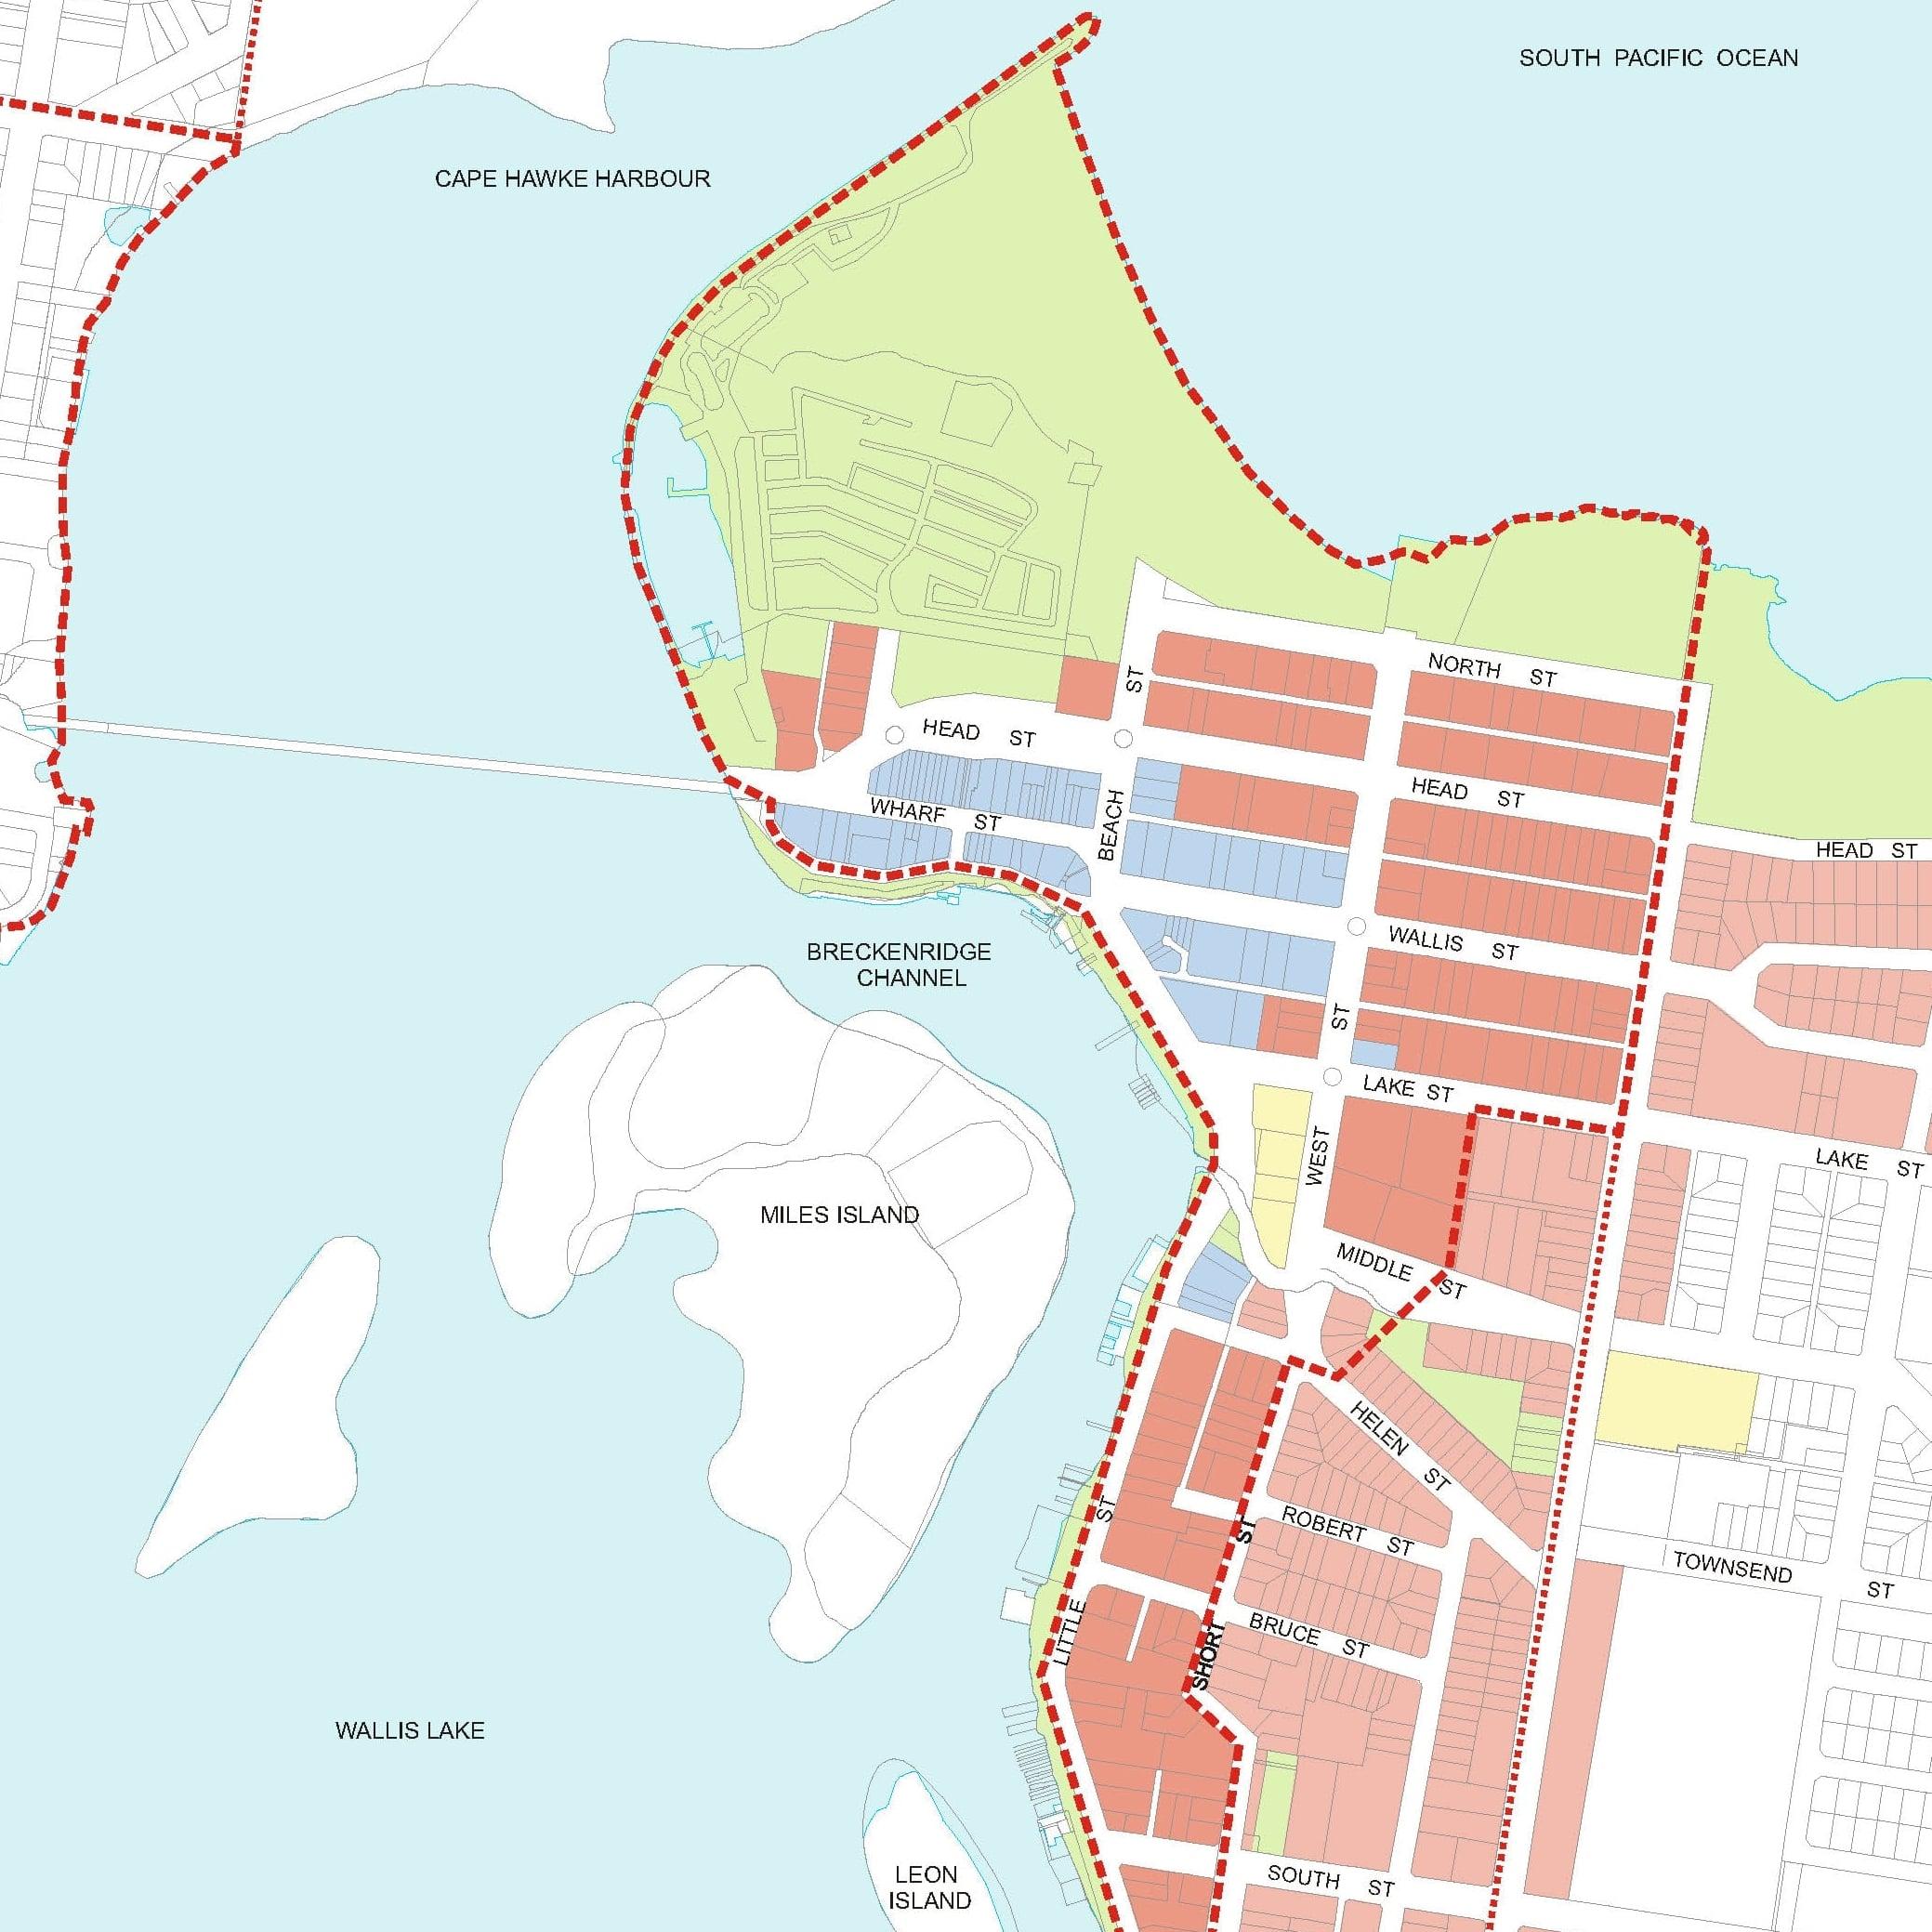 Forster Development Control Plan